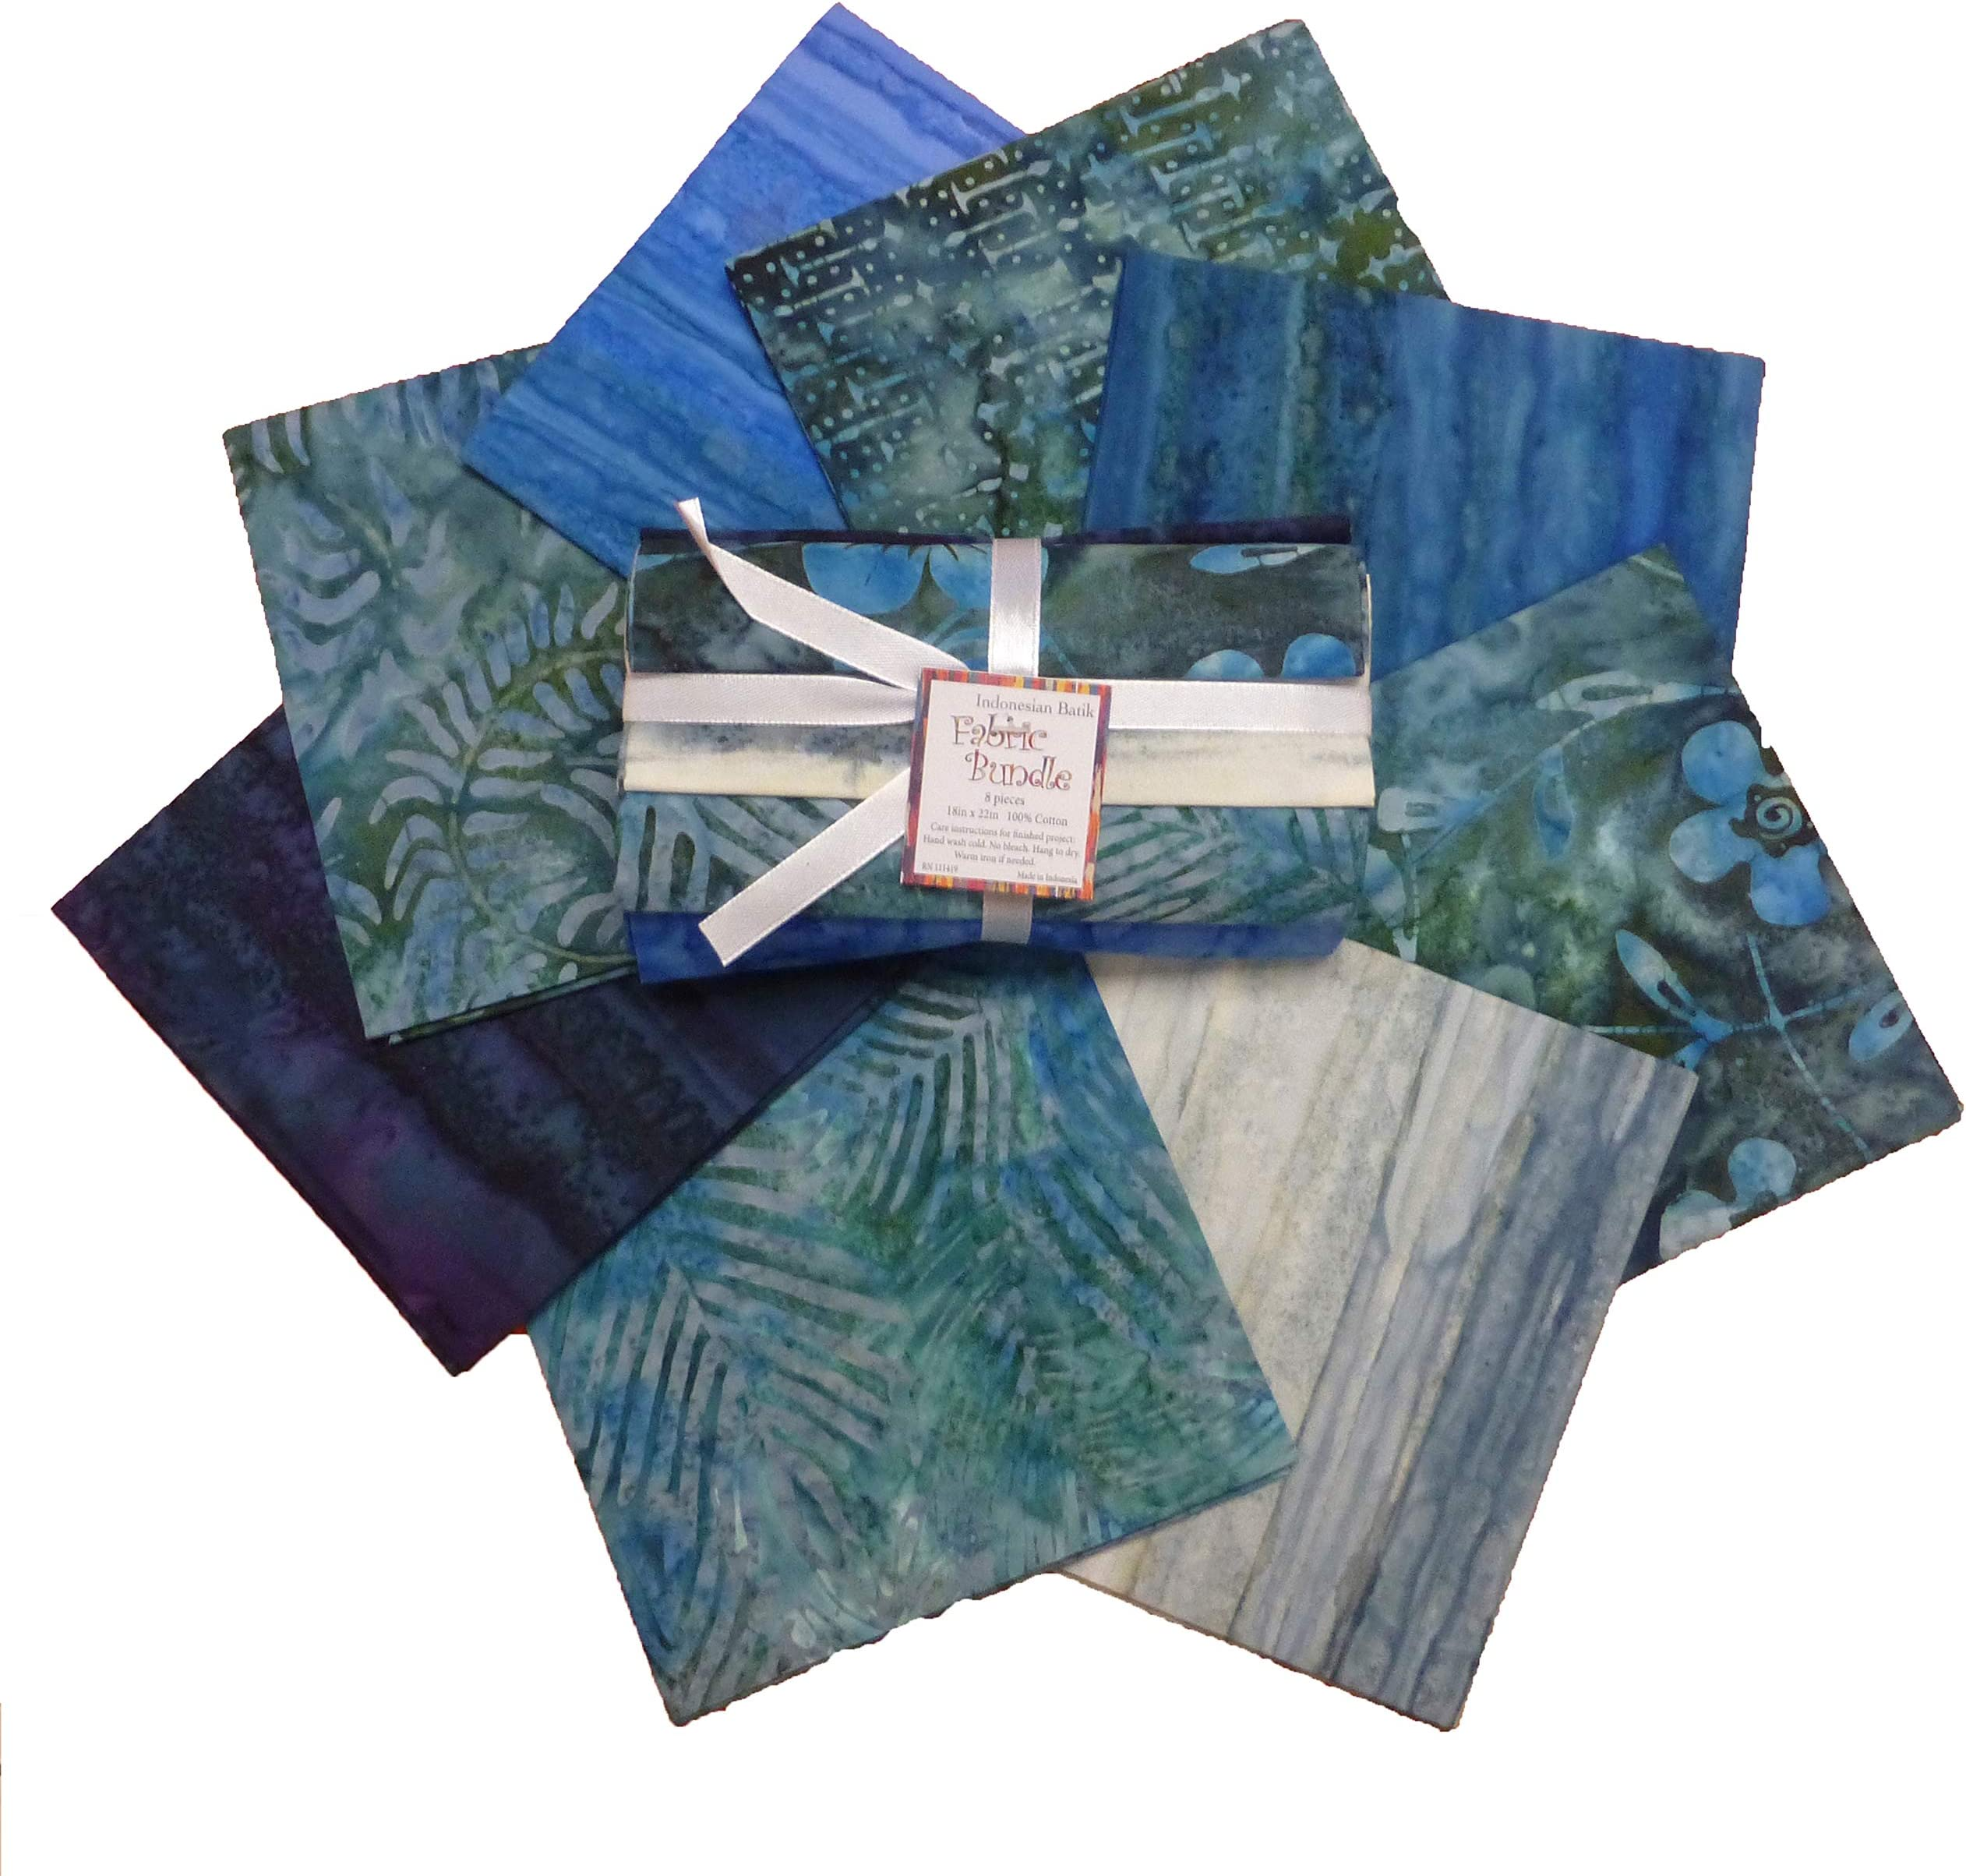 9 Fat Quarter Batik Sampler Emerald City Special Edition with Free Shipping